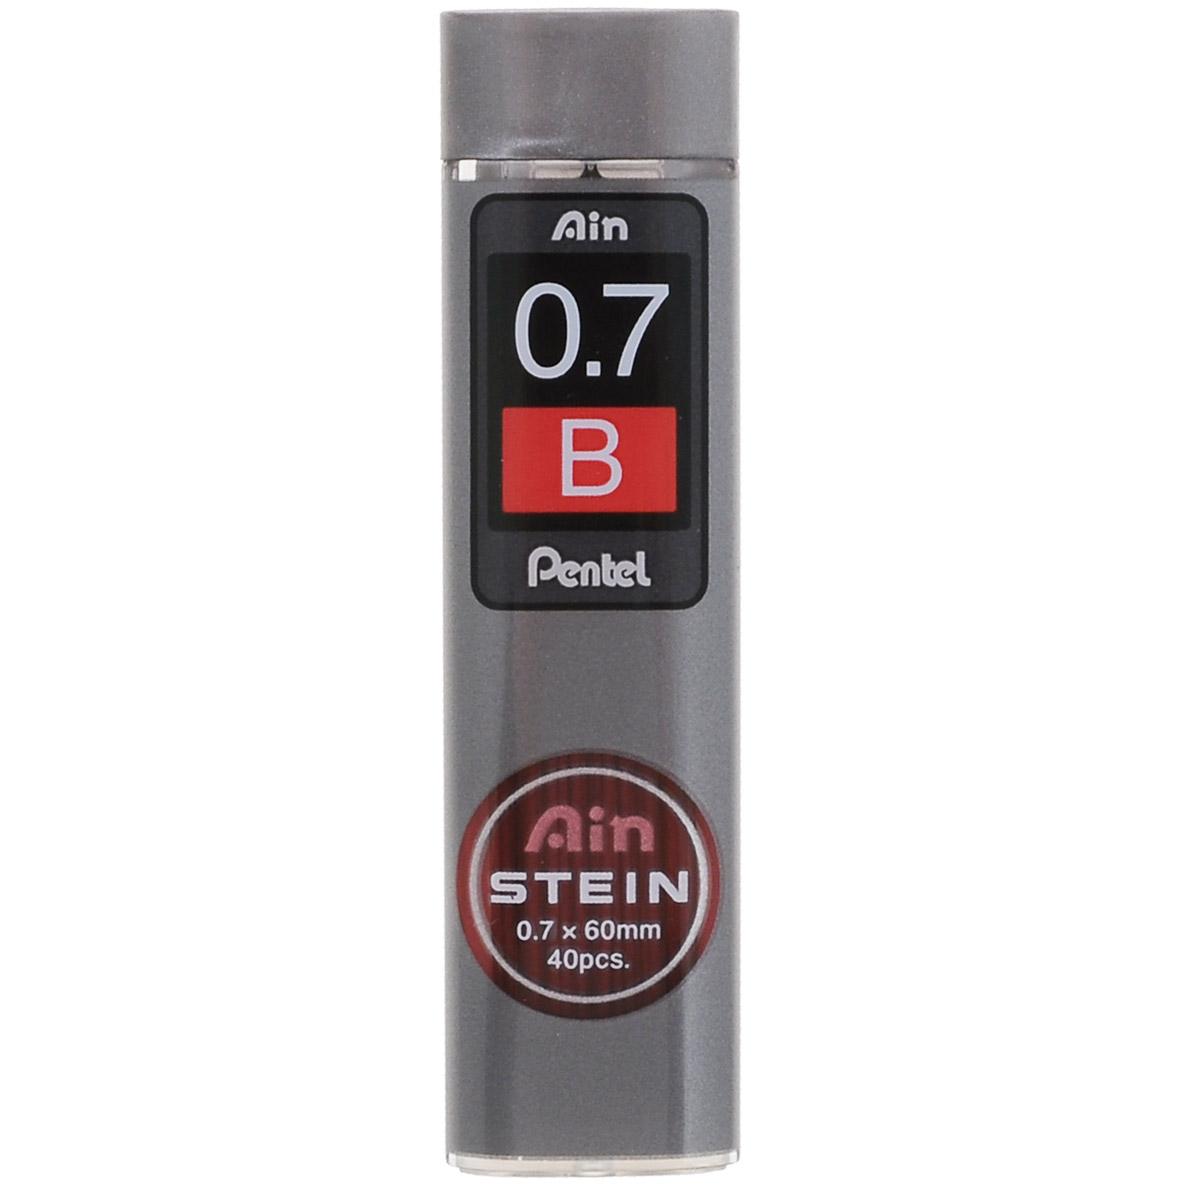 Pentel Грифели для автоматических карандашей Ain Stein B 0,7 мм 40 шт -  Карандаши